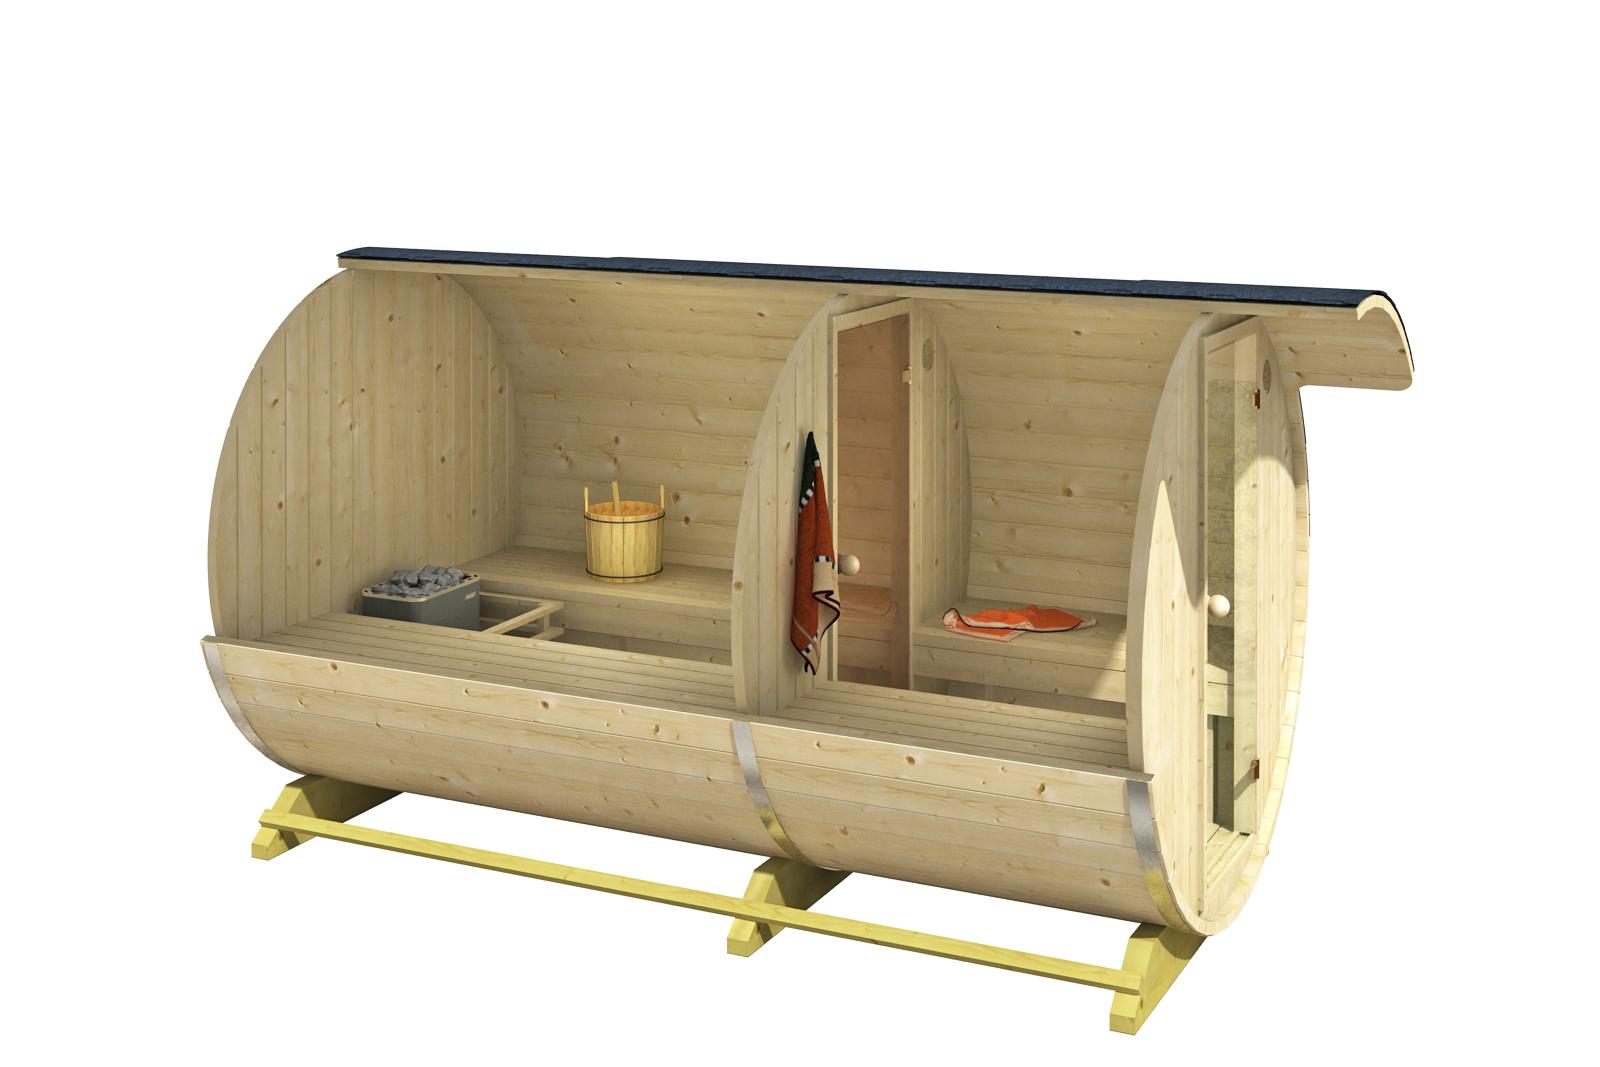 finn therm fass sauna finn. Black Bedroom Furniture Sets. Home Design Ideas